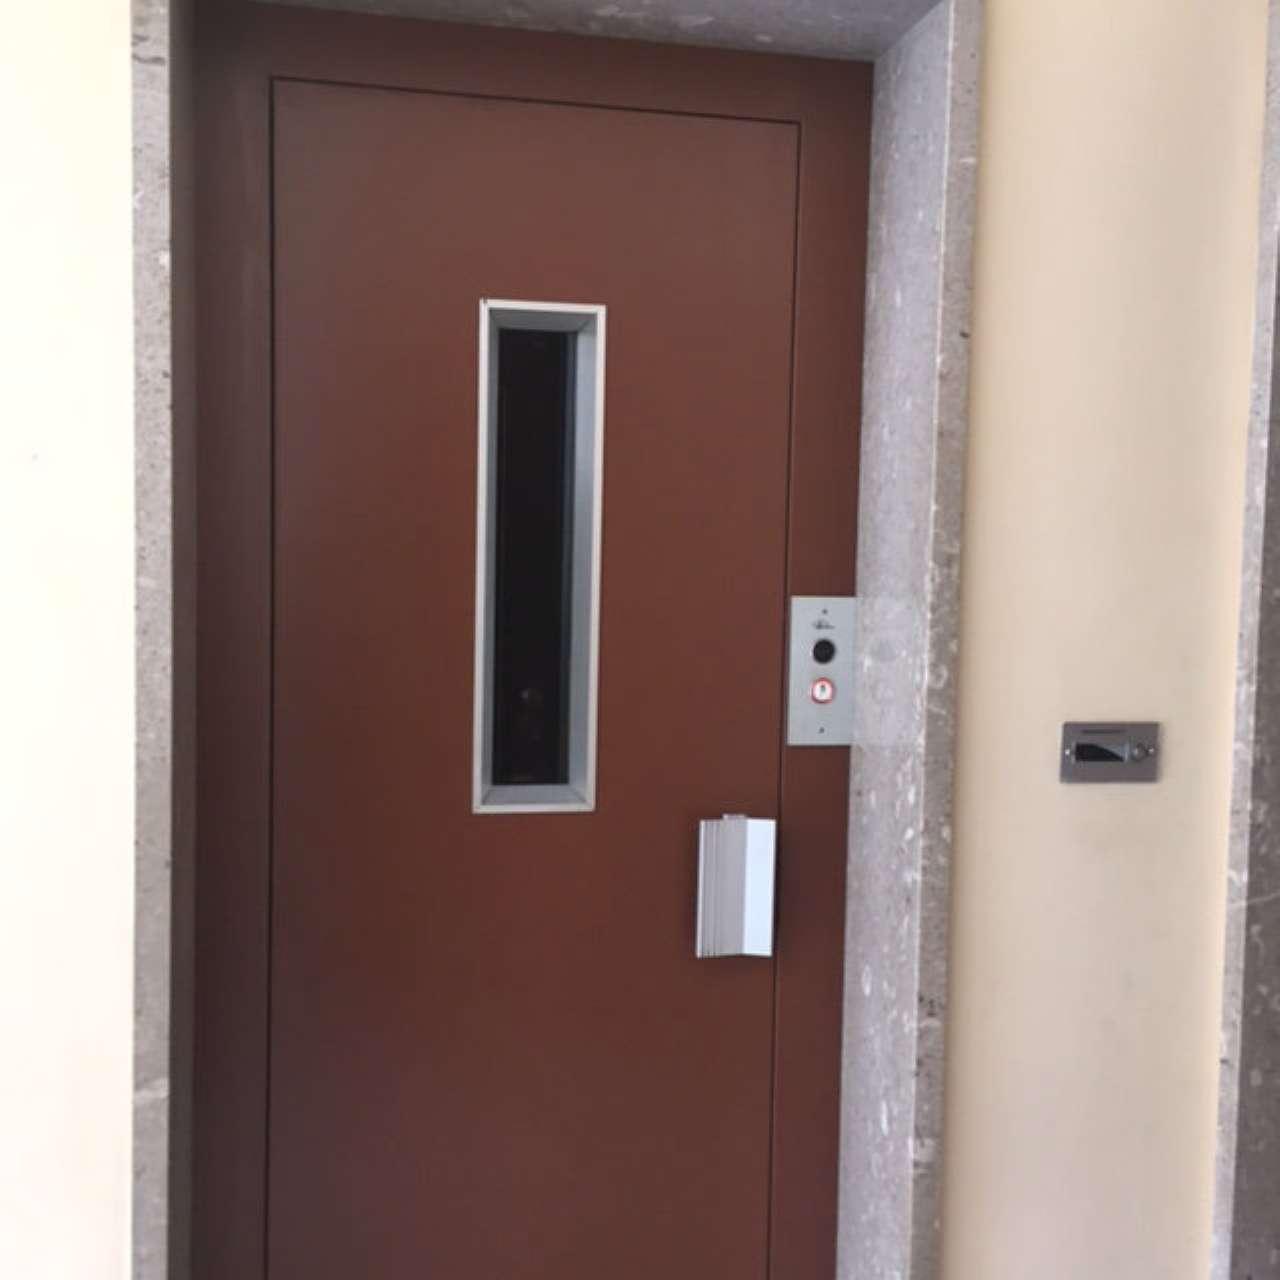 Foto 10 di Appartamento via Arnaldo da Brescia, Torino (zona Lingotto)